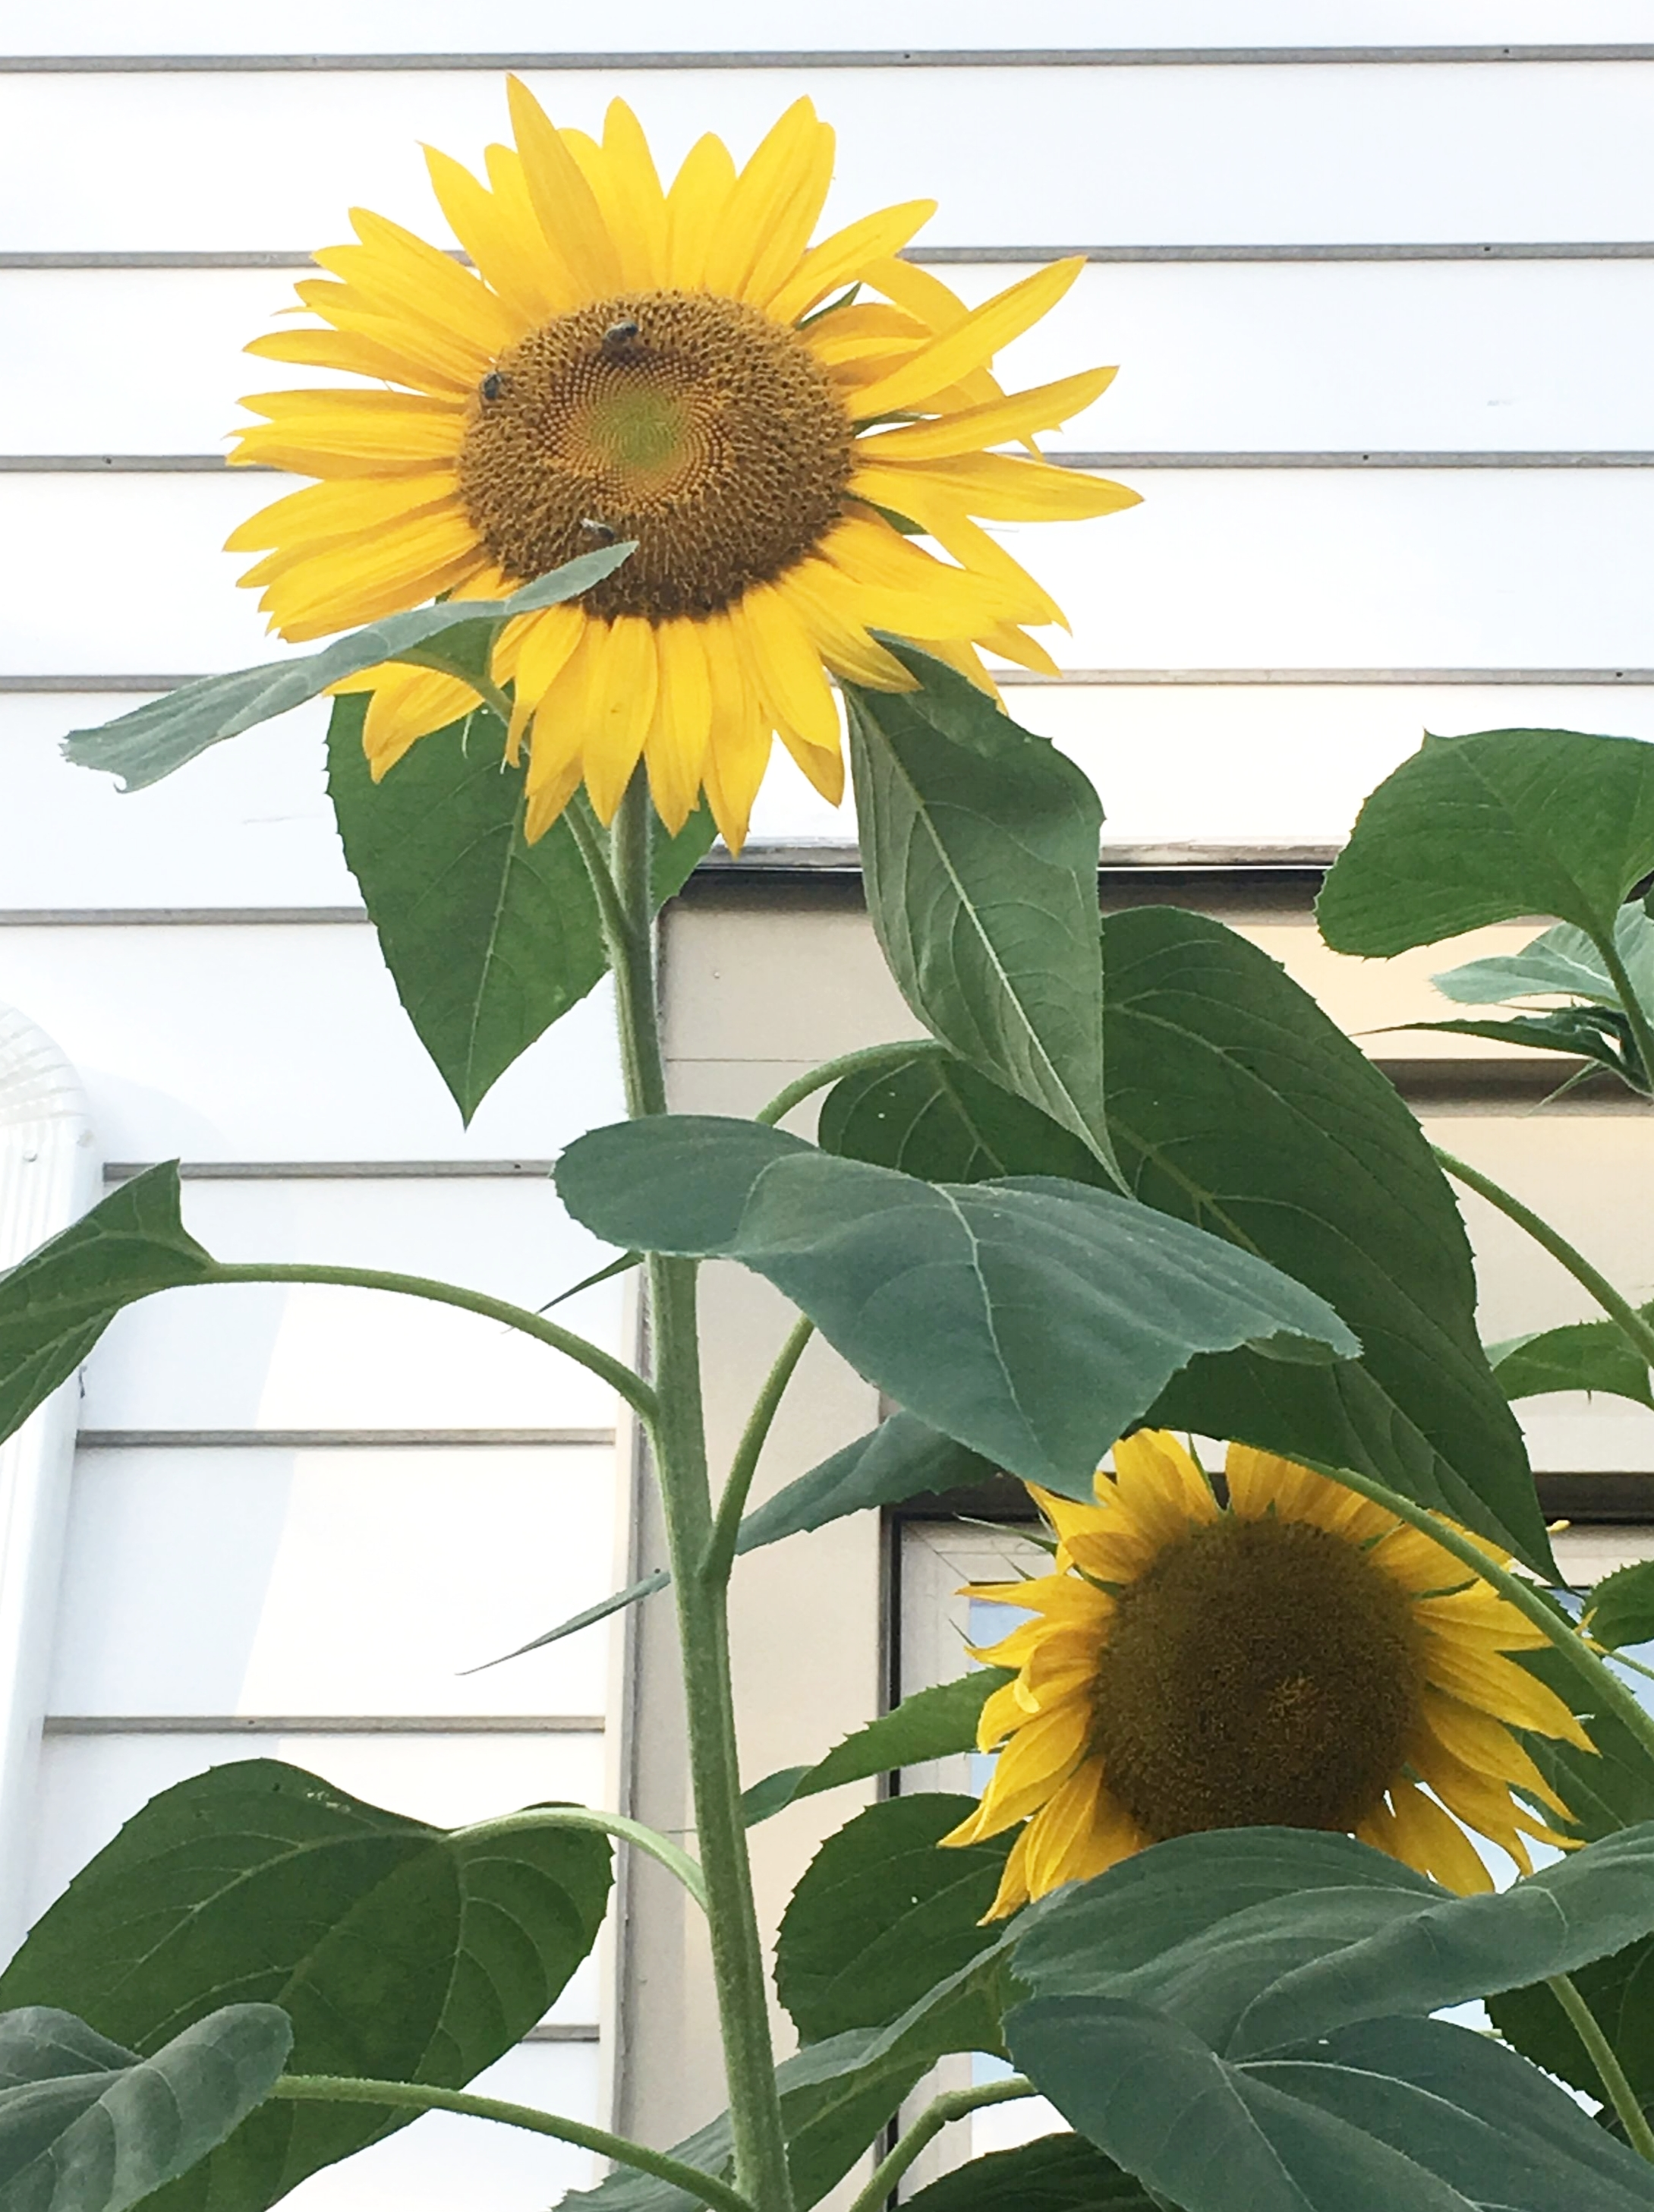 Sunflowers in my garden! #tevGardens